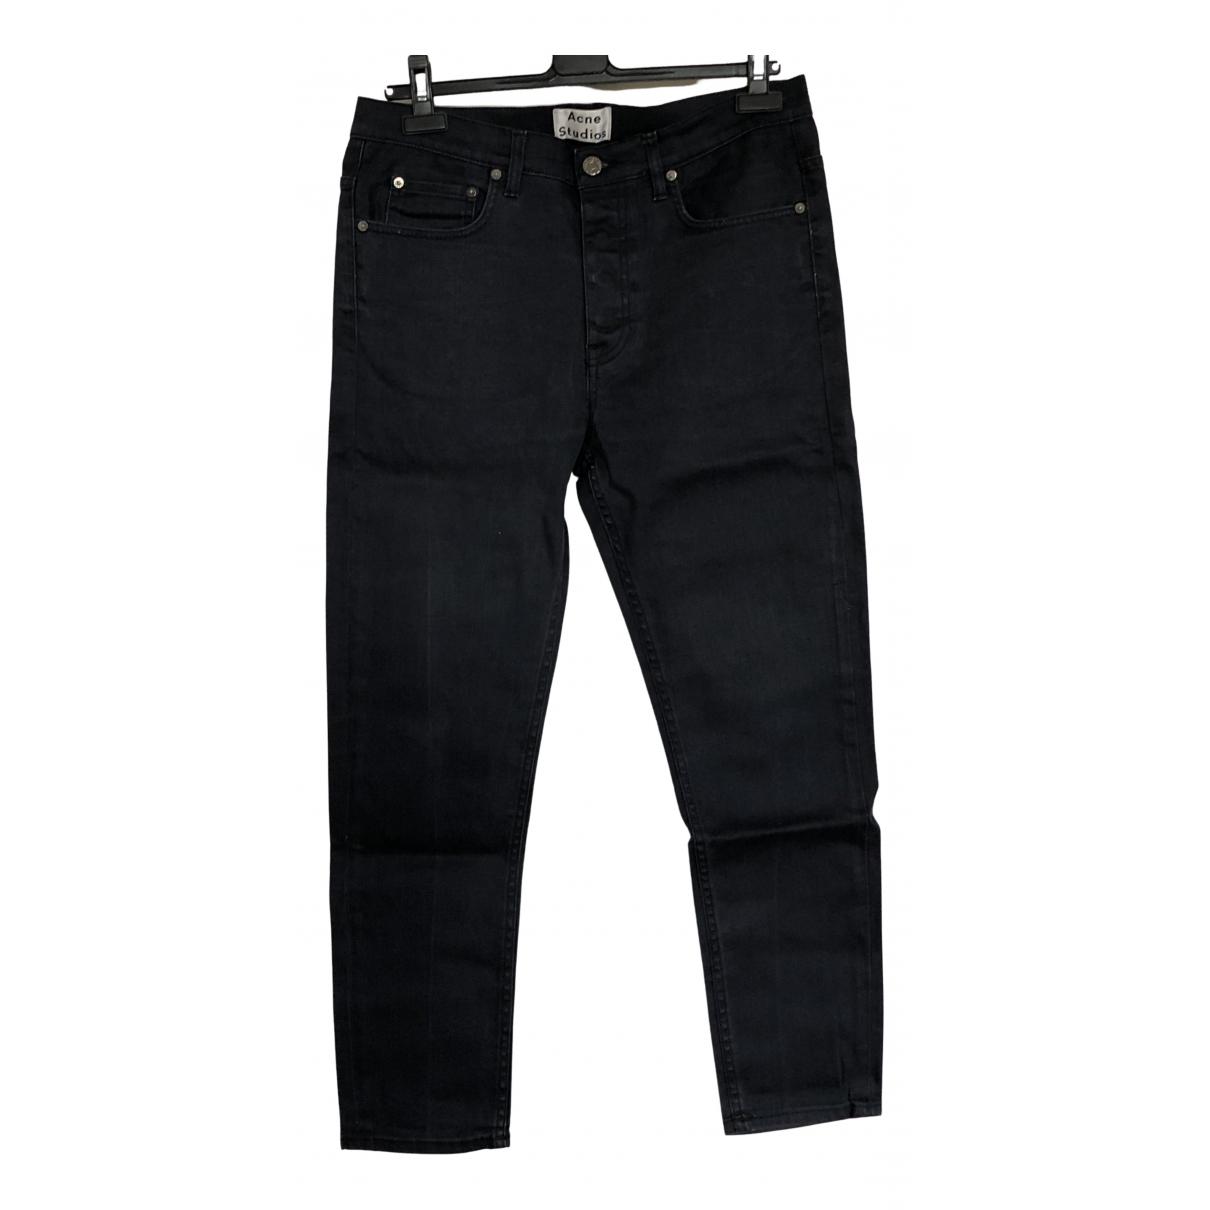 Acne Studios \N Navy Cotton - elasthane Jeans for Men 33 US